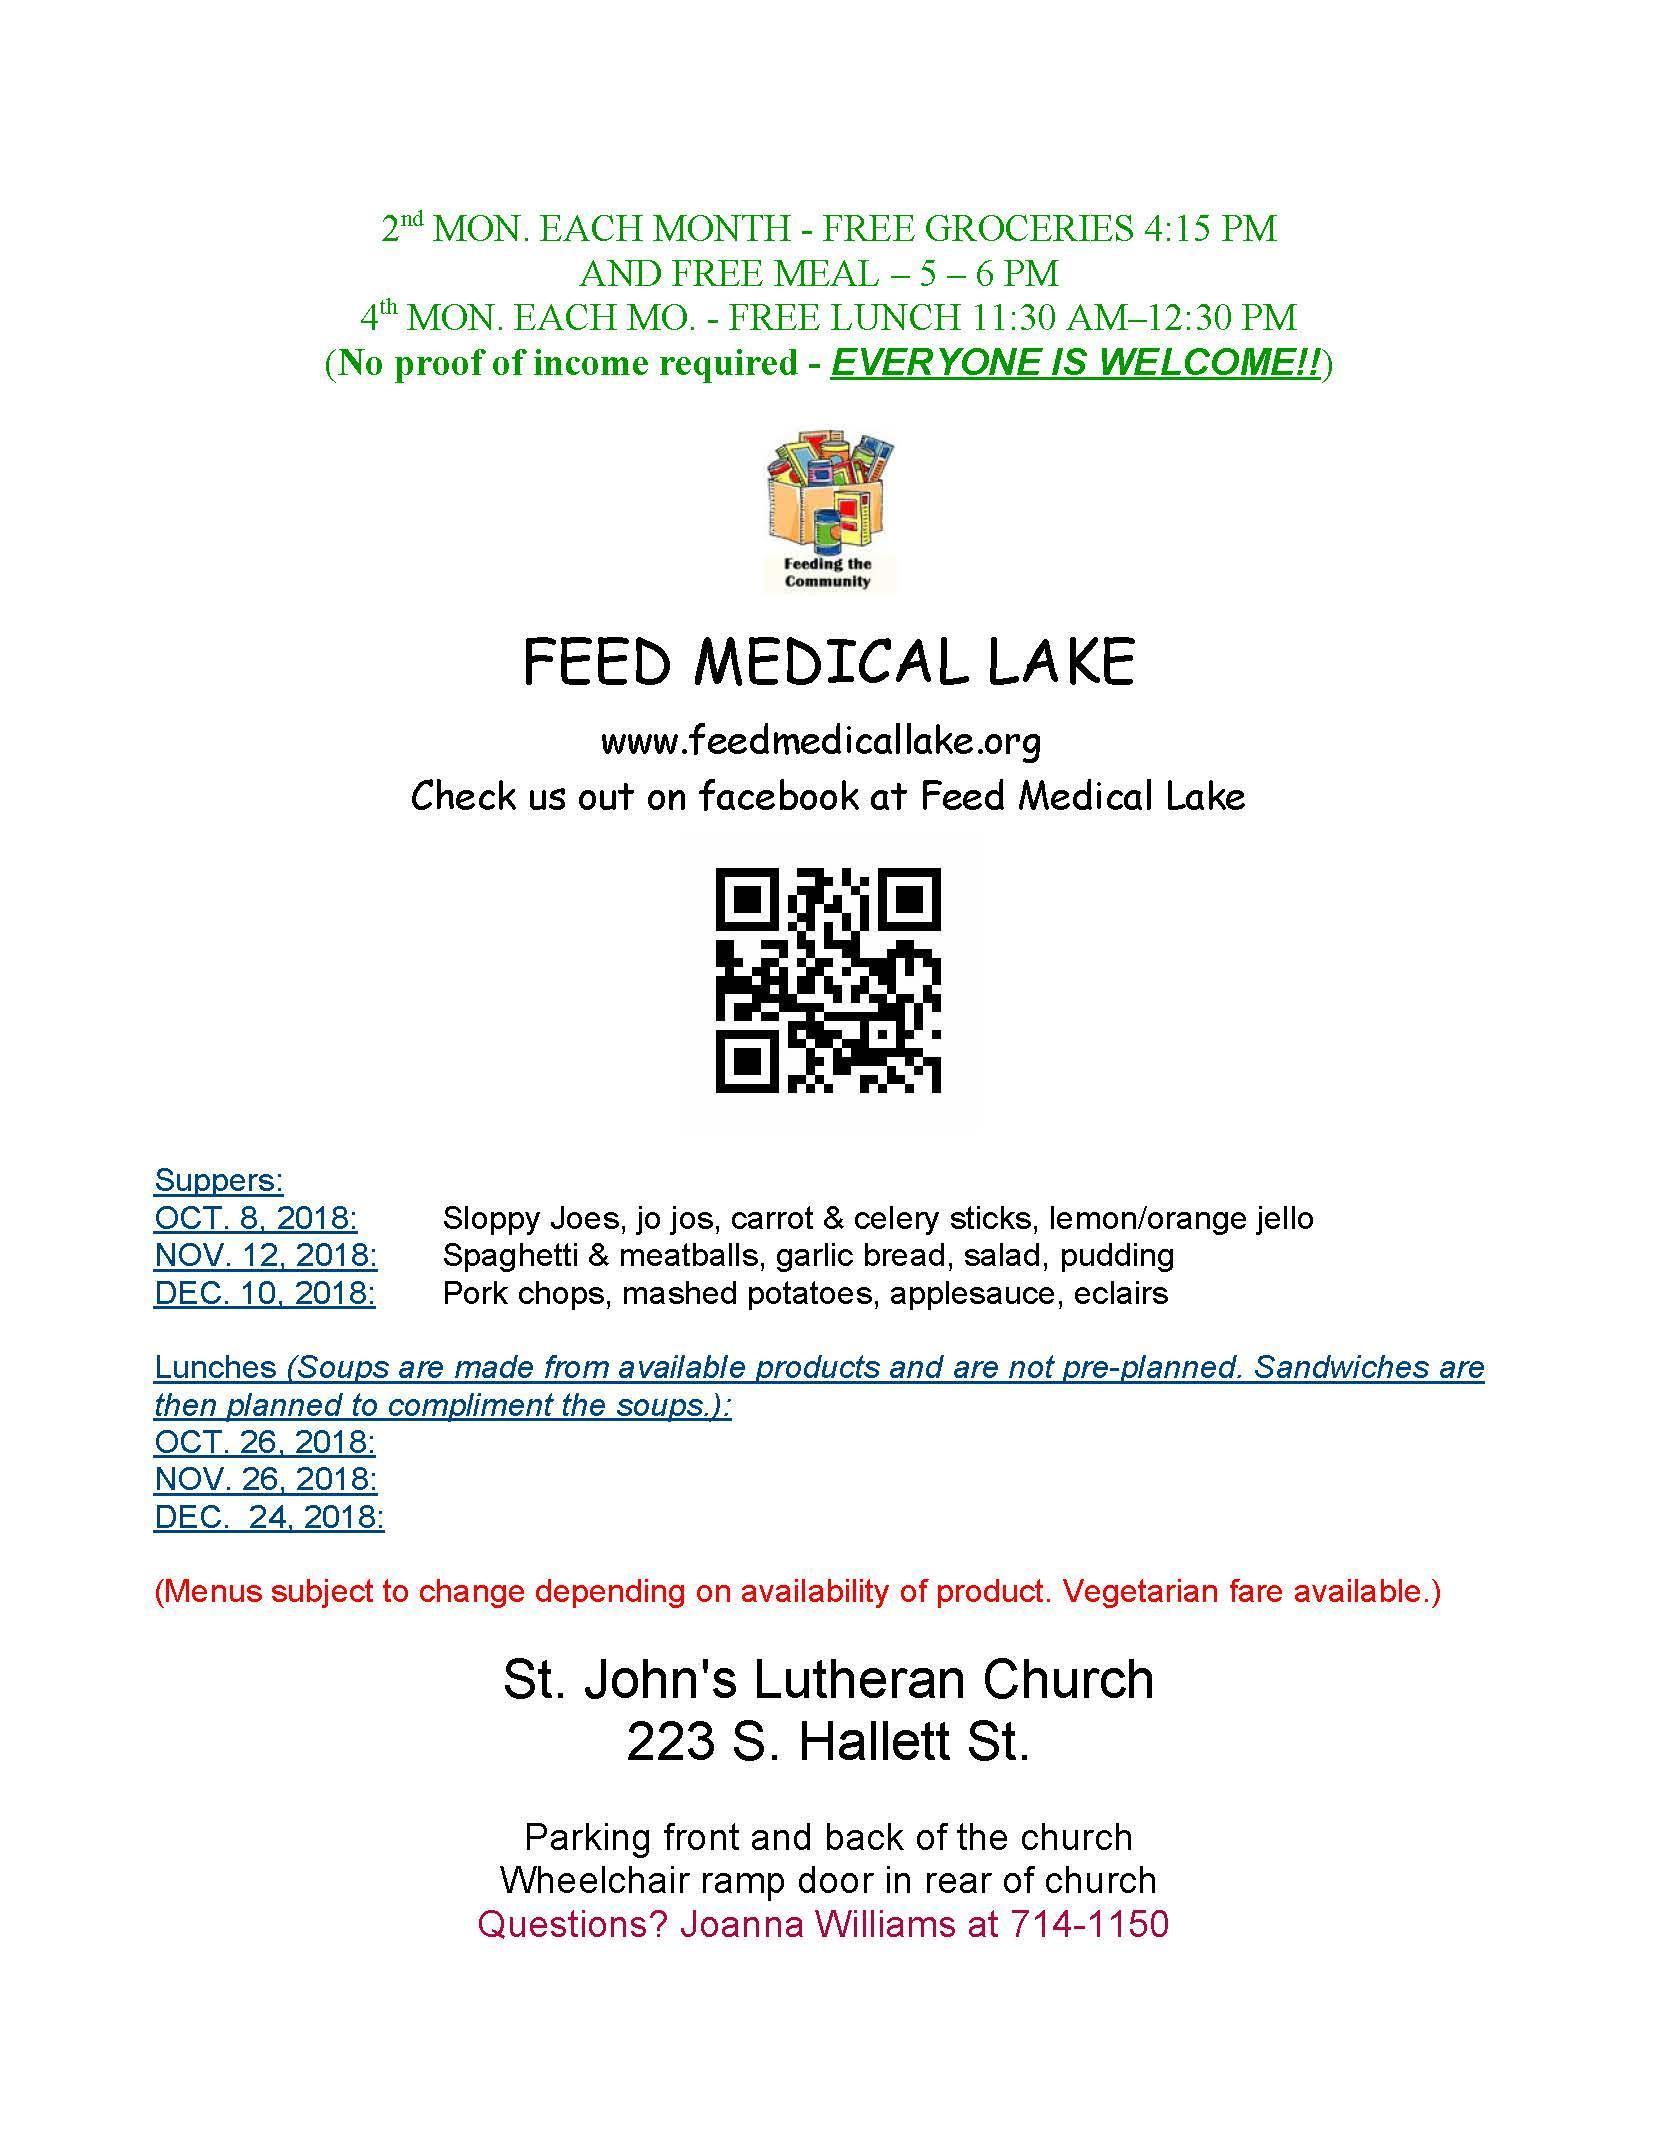 Feed Medical Lake Fall Dates